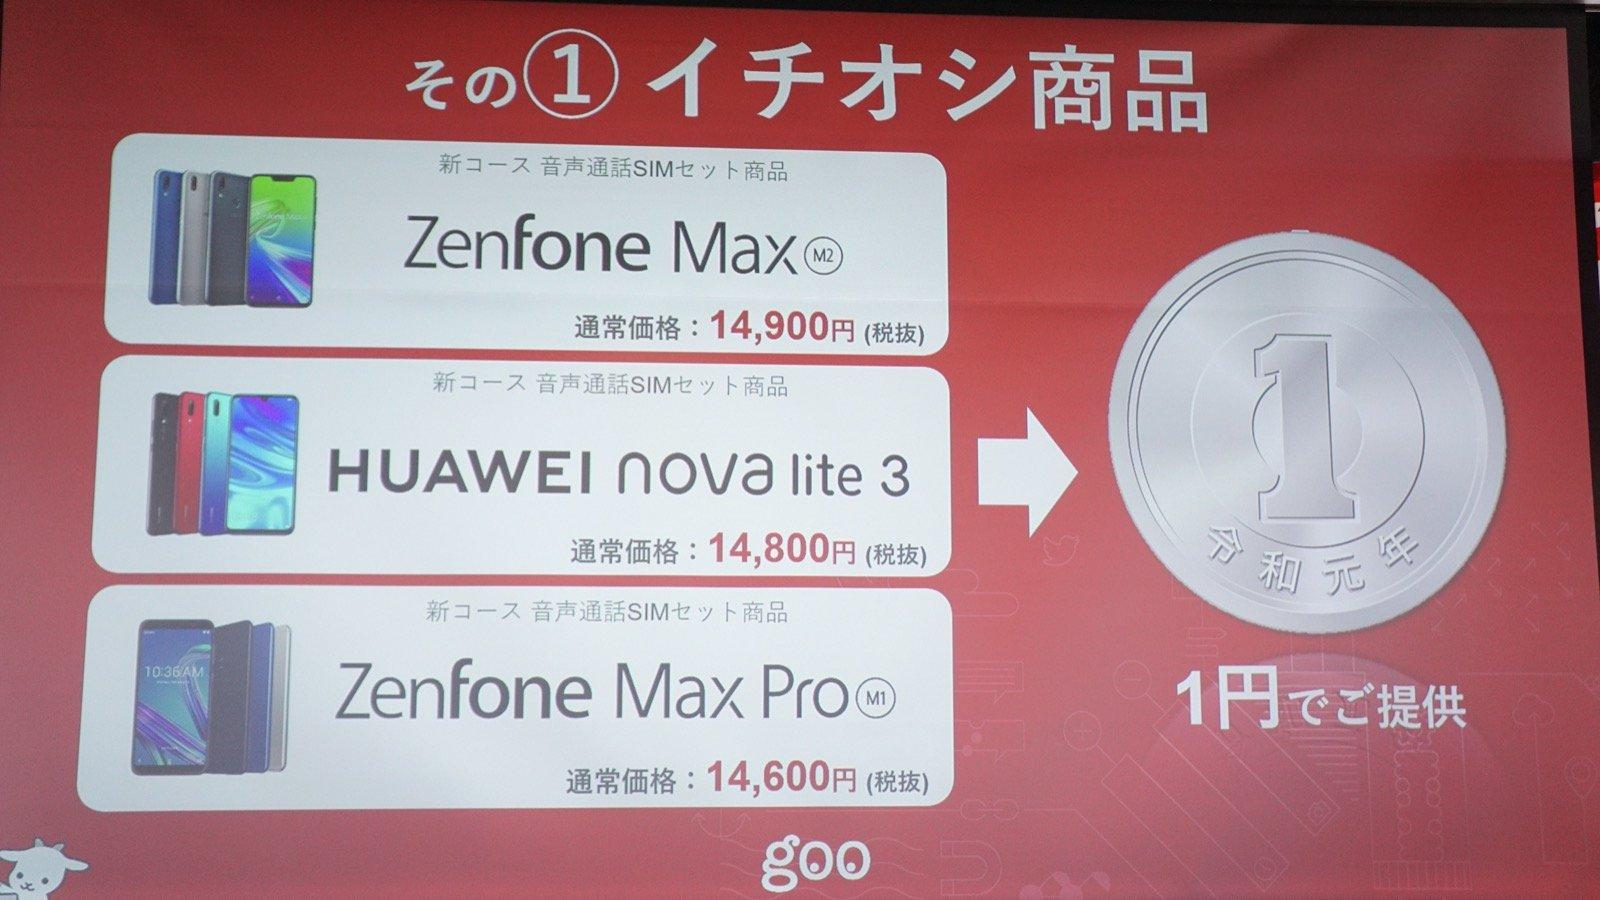 "goo Simseller、iPhoneなど大特価セール開催。""1円""販売も"